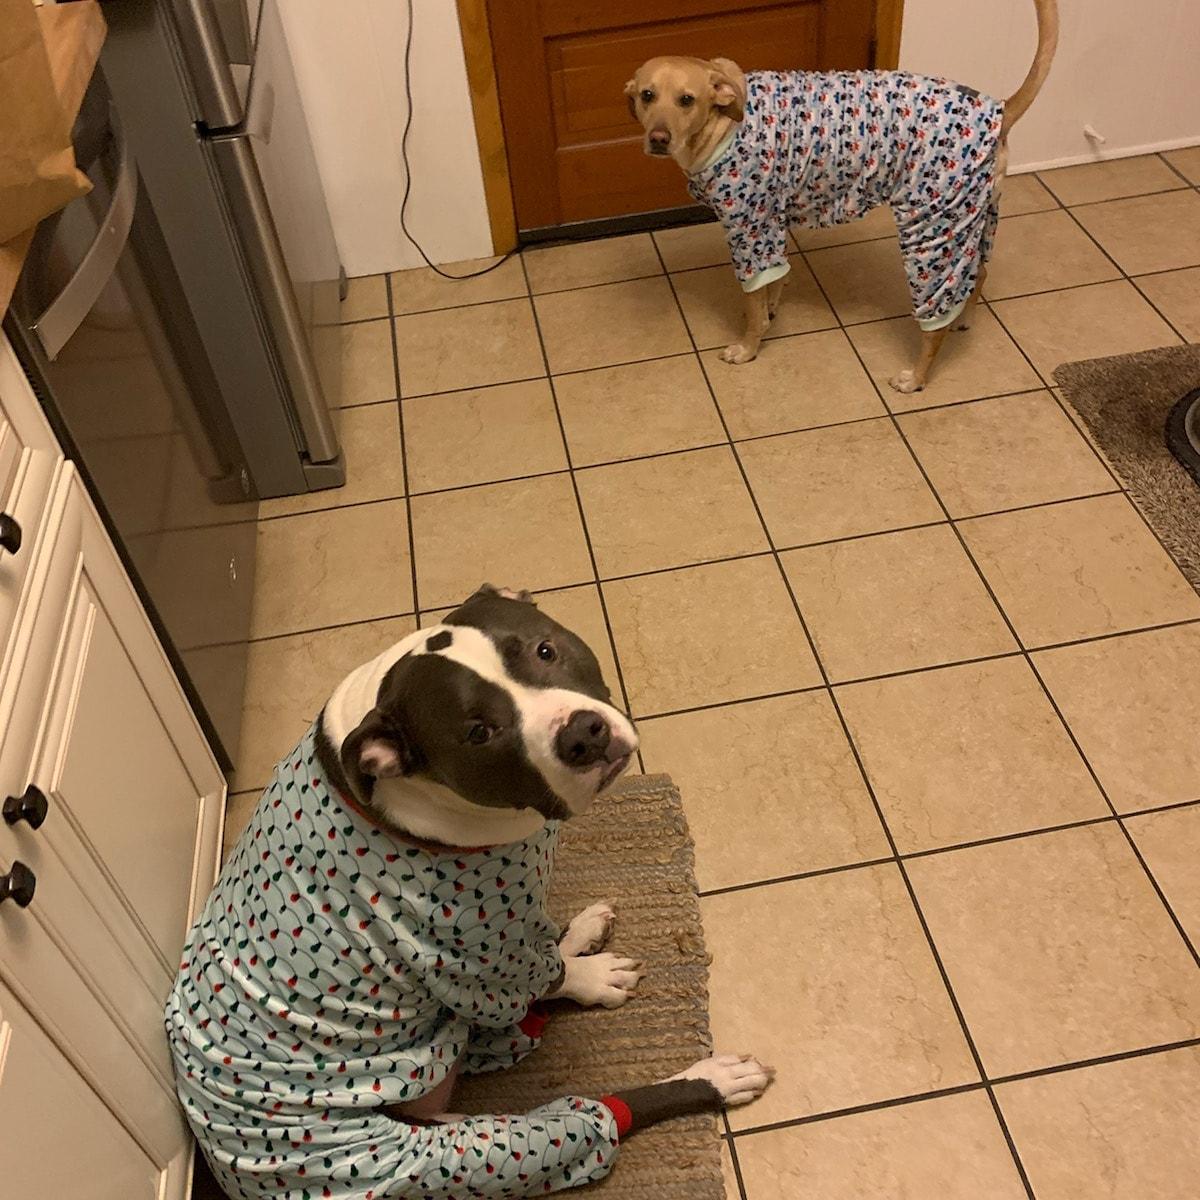 They actually like these. Lol  #merchantserviceinnovations #dog #dogs #pitbull #pitbulls #cur #yellowcur #dogslife #dogsofinstagram #dogsarefamily #dogspajamas #dogspjs #lol #funny #warm #theylikethempic.twitter.com/g8kC28lRMM